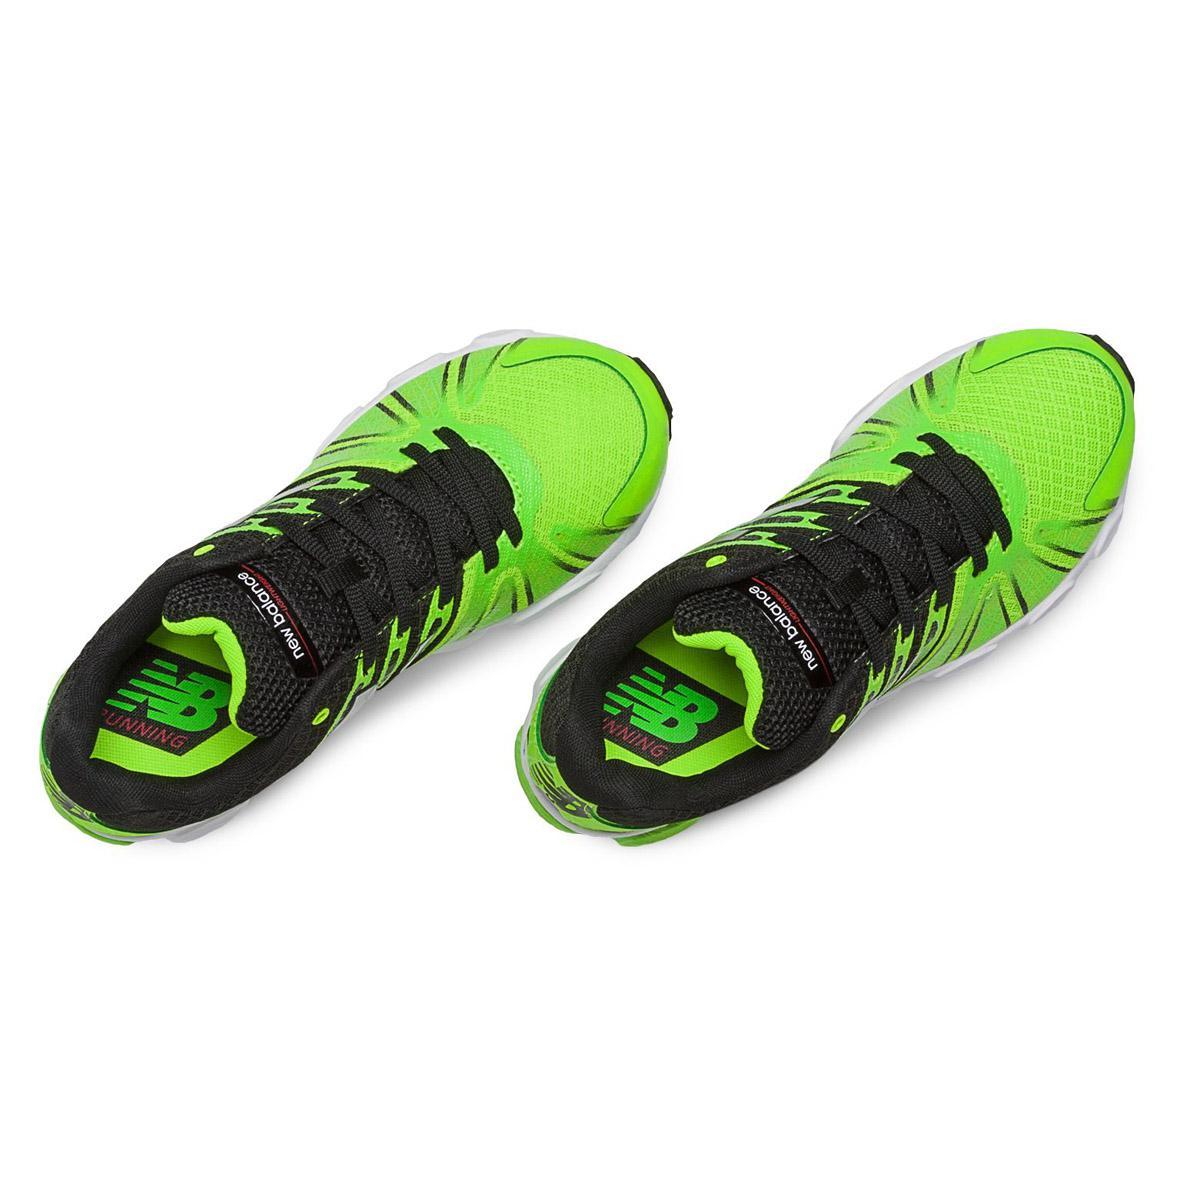 Greenblack New Balance Lime 890v5 Boys Running Shoes w0BqYSw